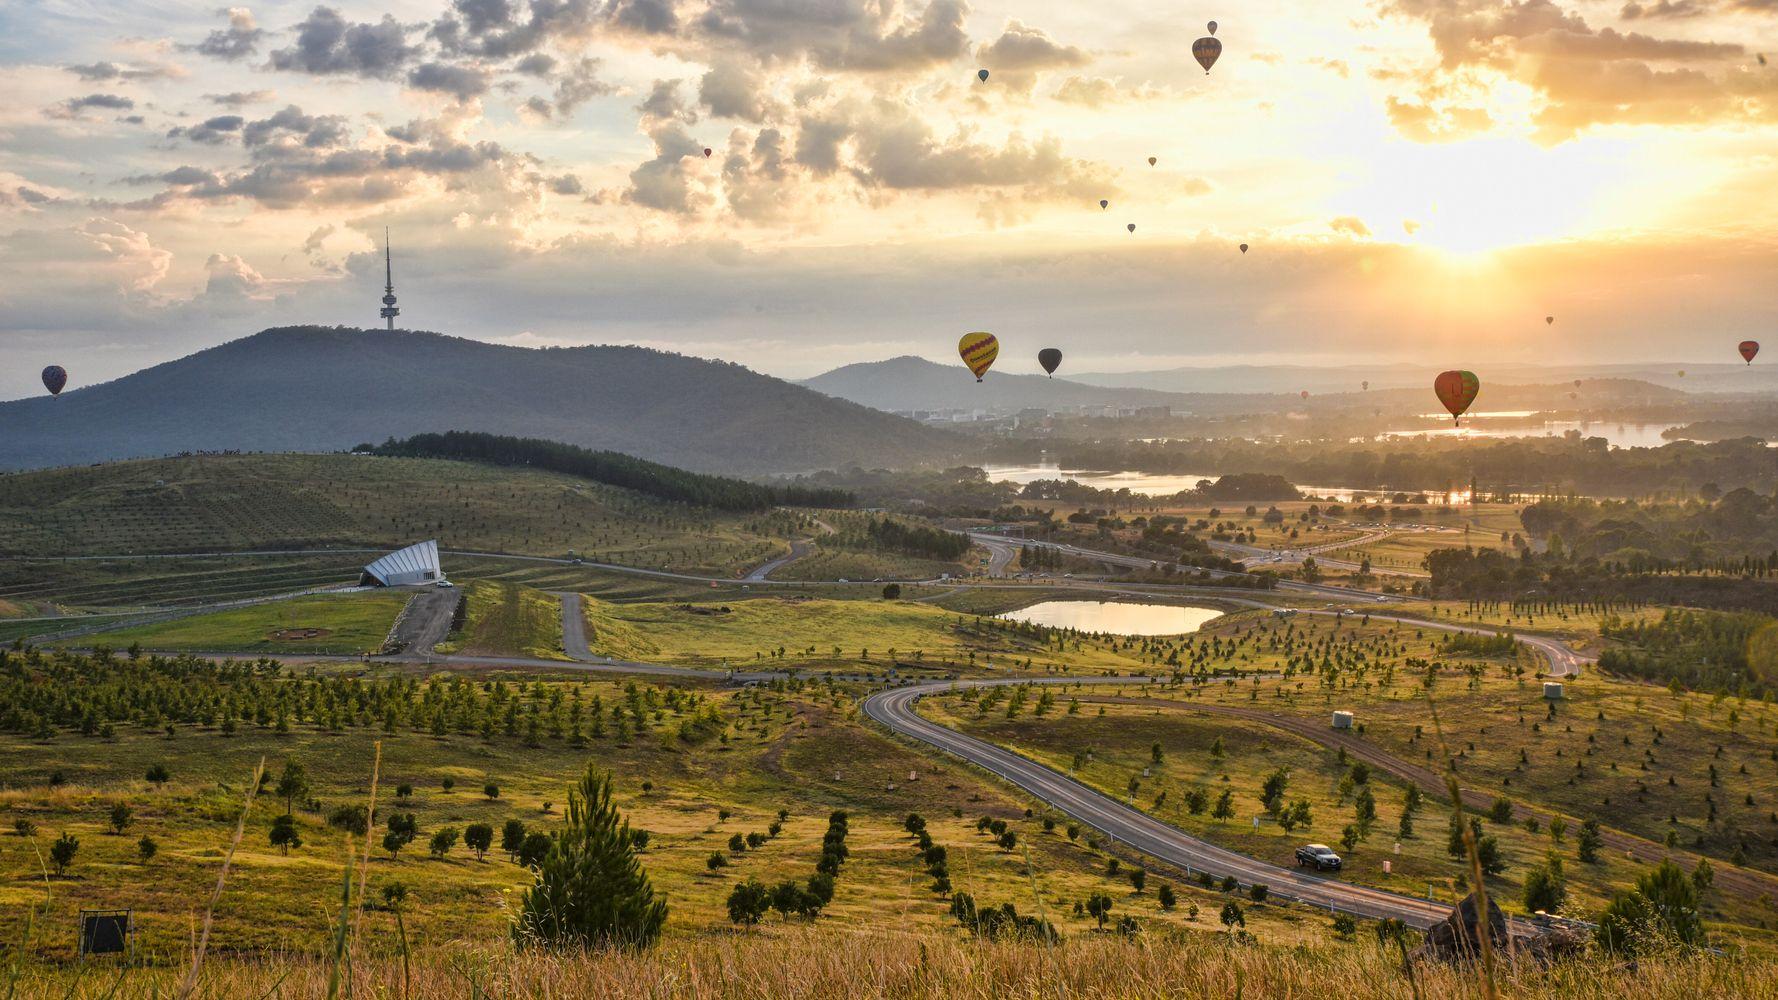 Aerial photograph of Canberra landscape via Huffington post Australia